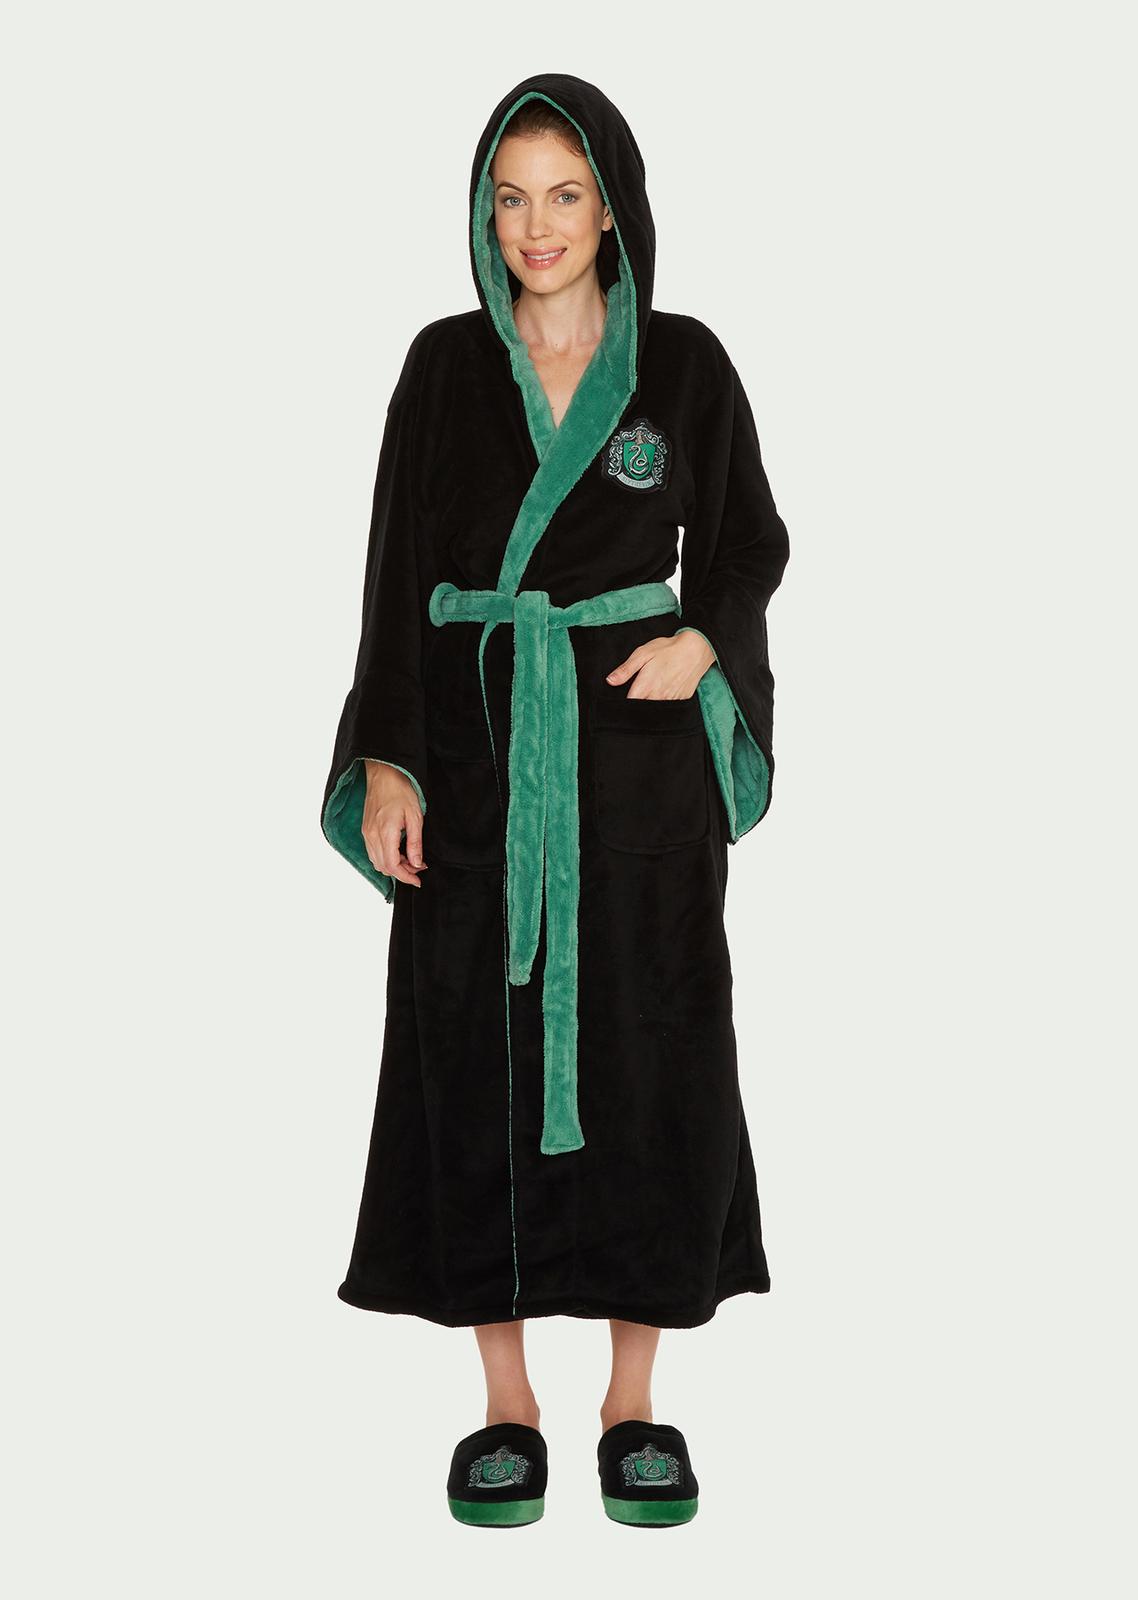 Harry Potter: Slytherin Fleece Robe - Black & Green Women's (One Size) image